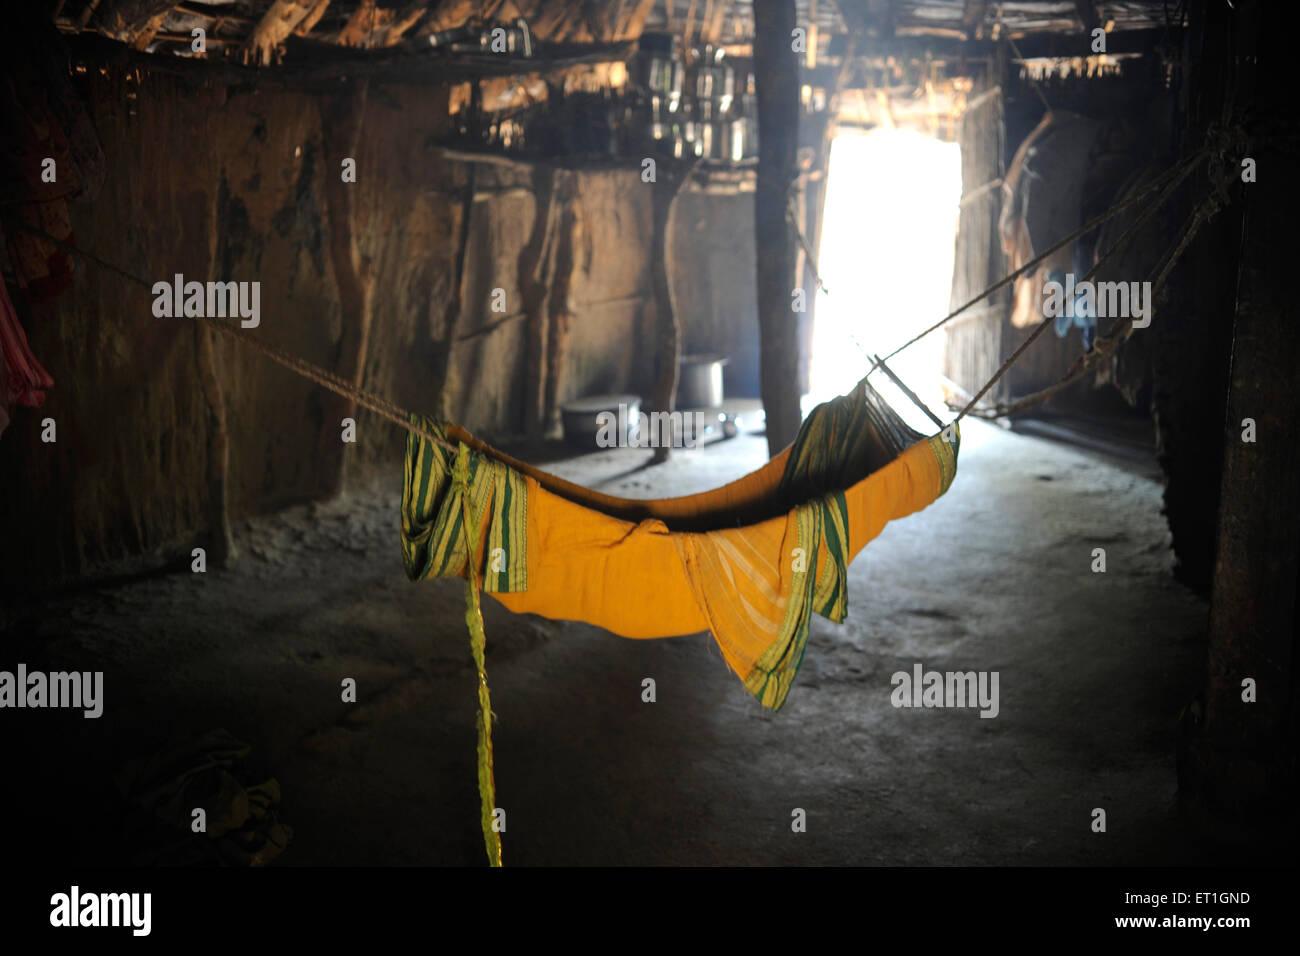 Soporte de tela en casa tribal ; ; Maharashtra India Imagen De Stock